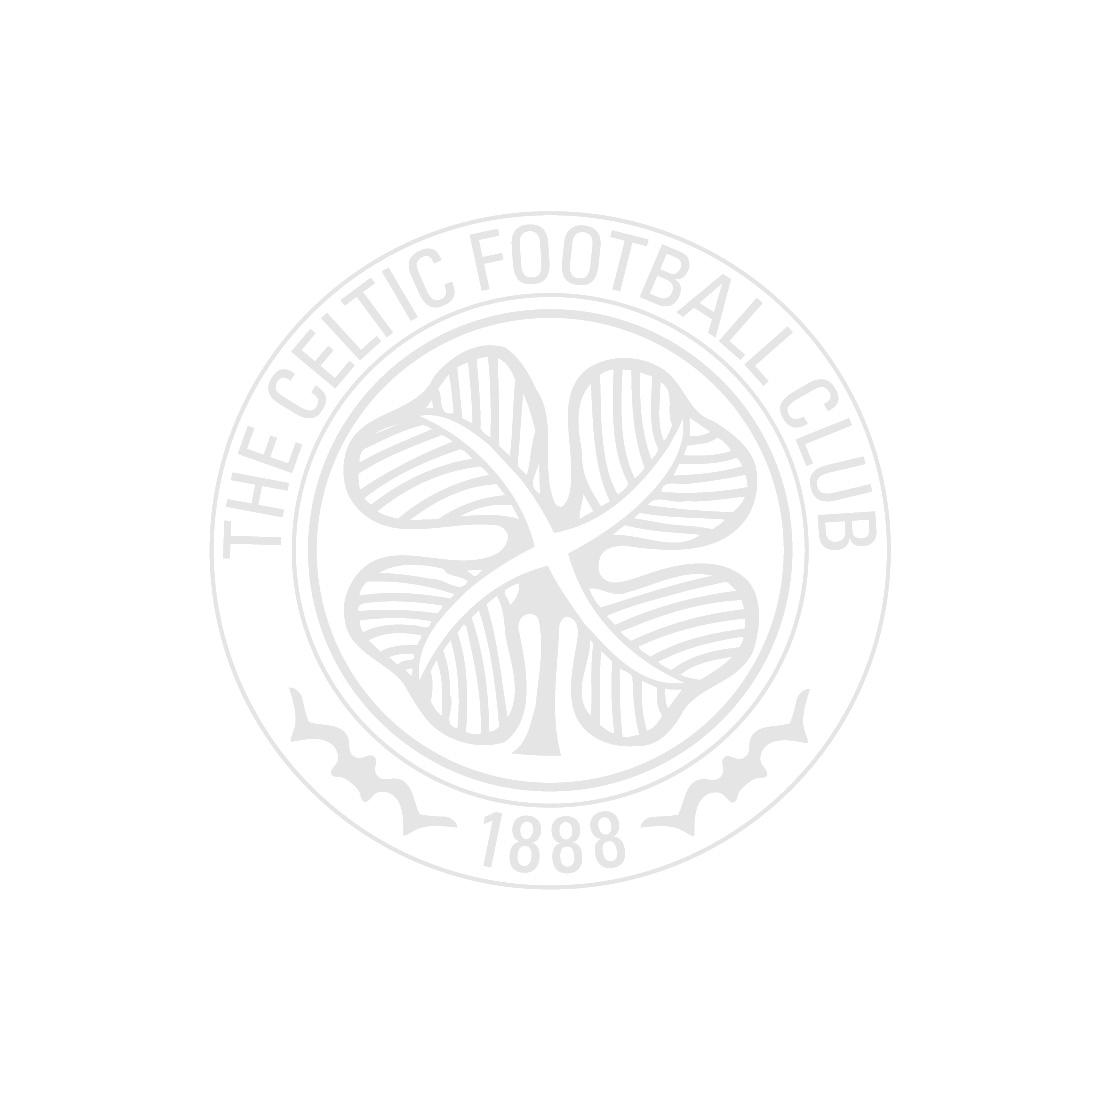 Celtic 2018 Tartan Scarf